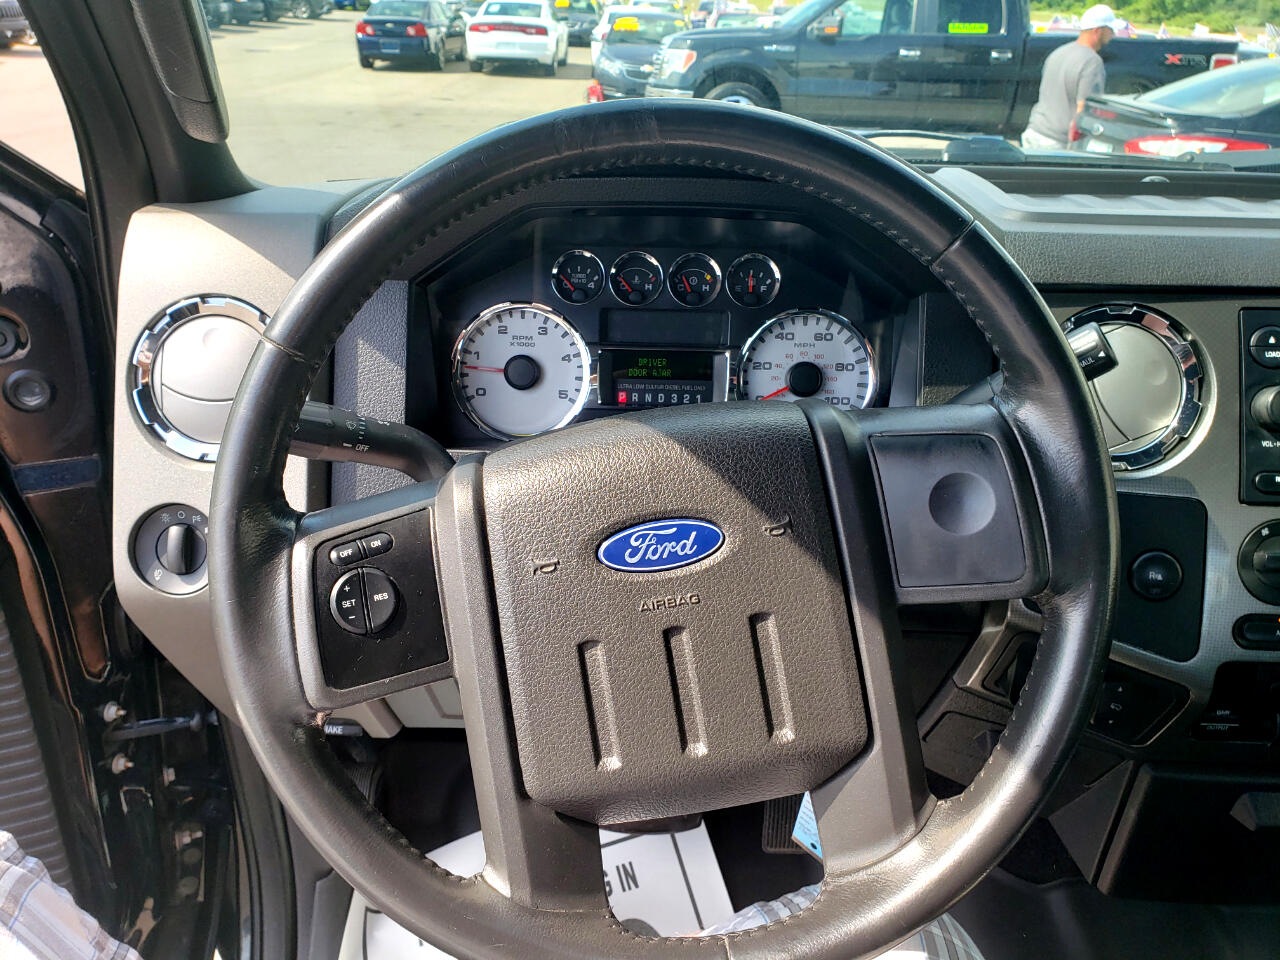 2008 Ford Super Duty F-250 SRW XLT 4WD Crew Cab 8' Box